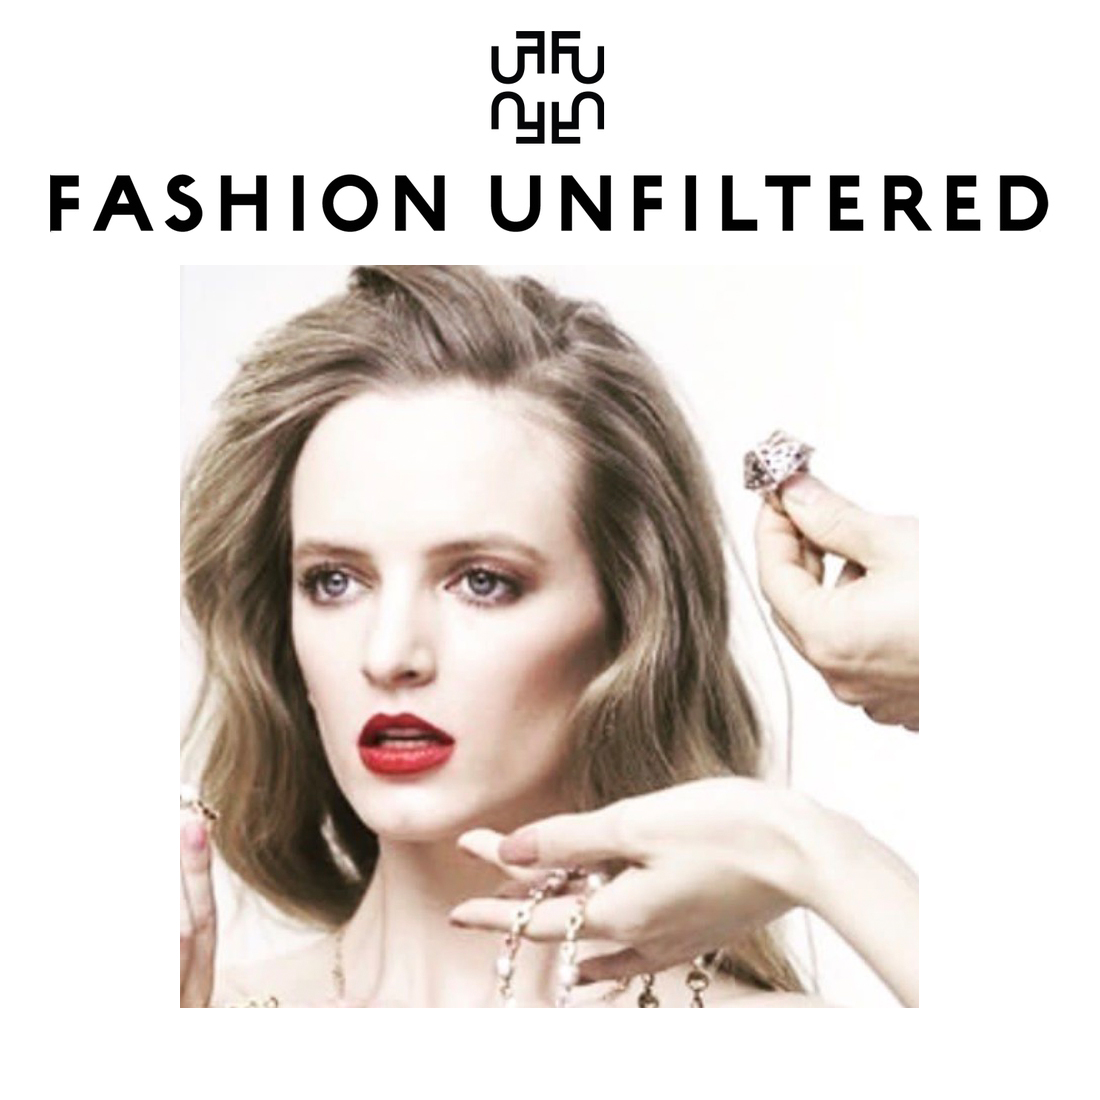 Fashion Unflitered 2 Photo.jpg